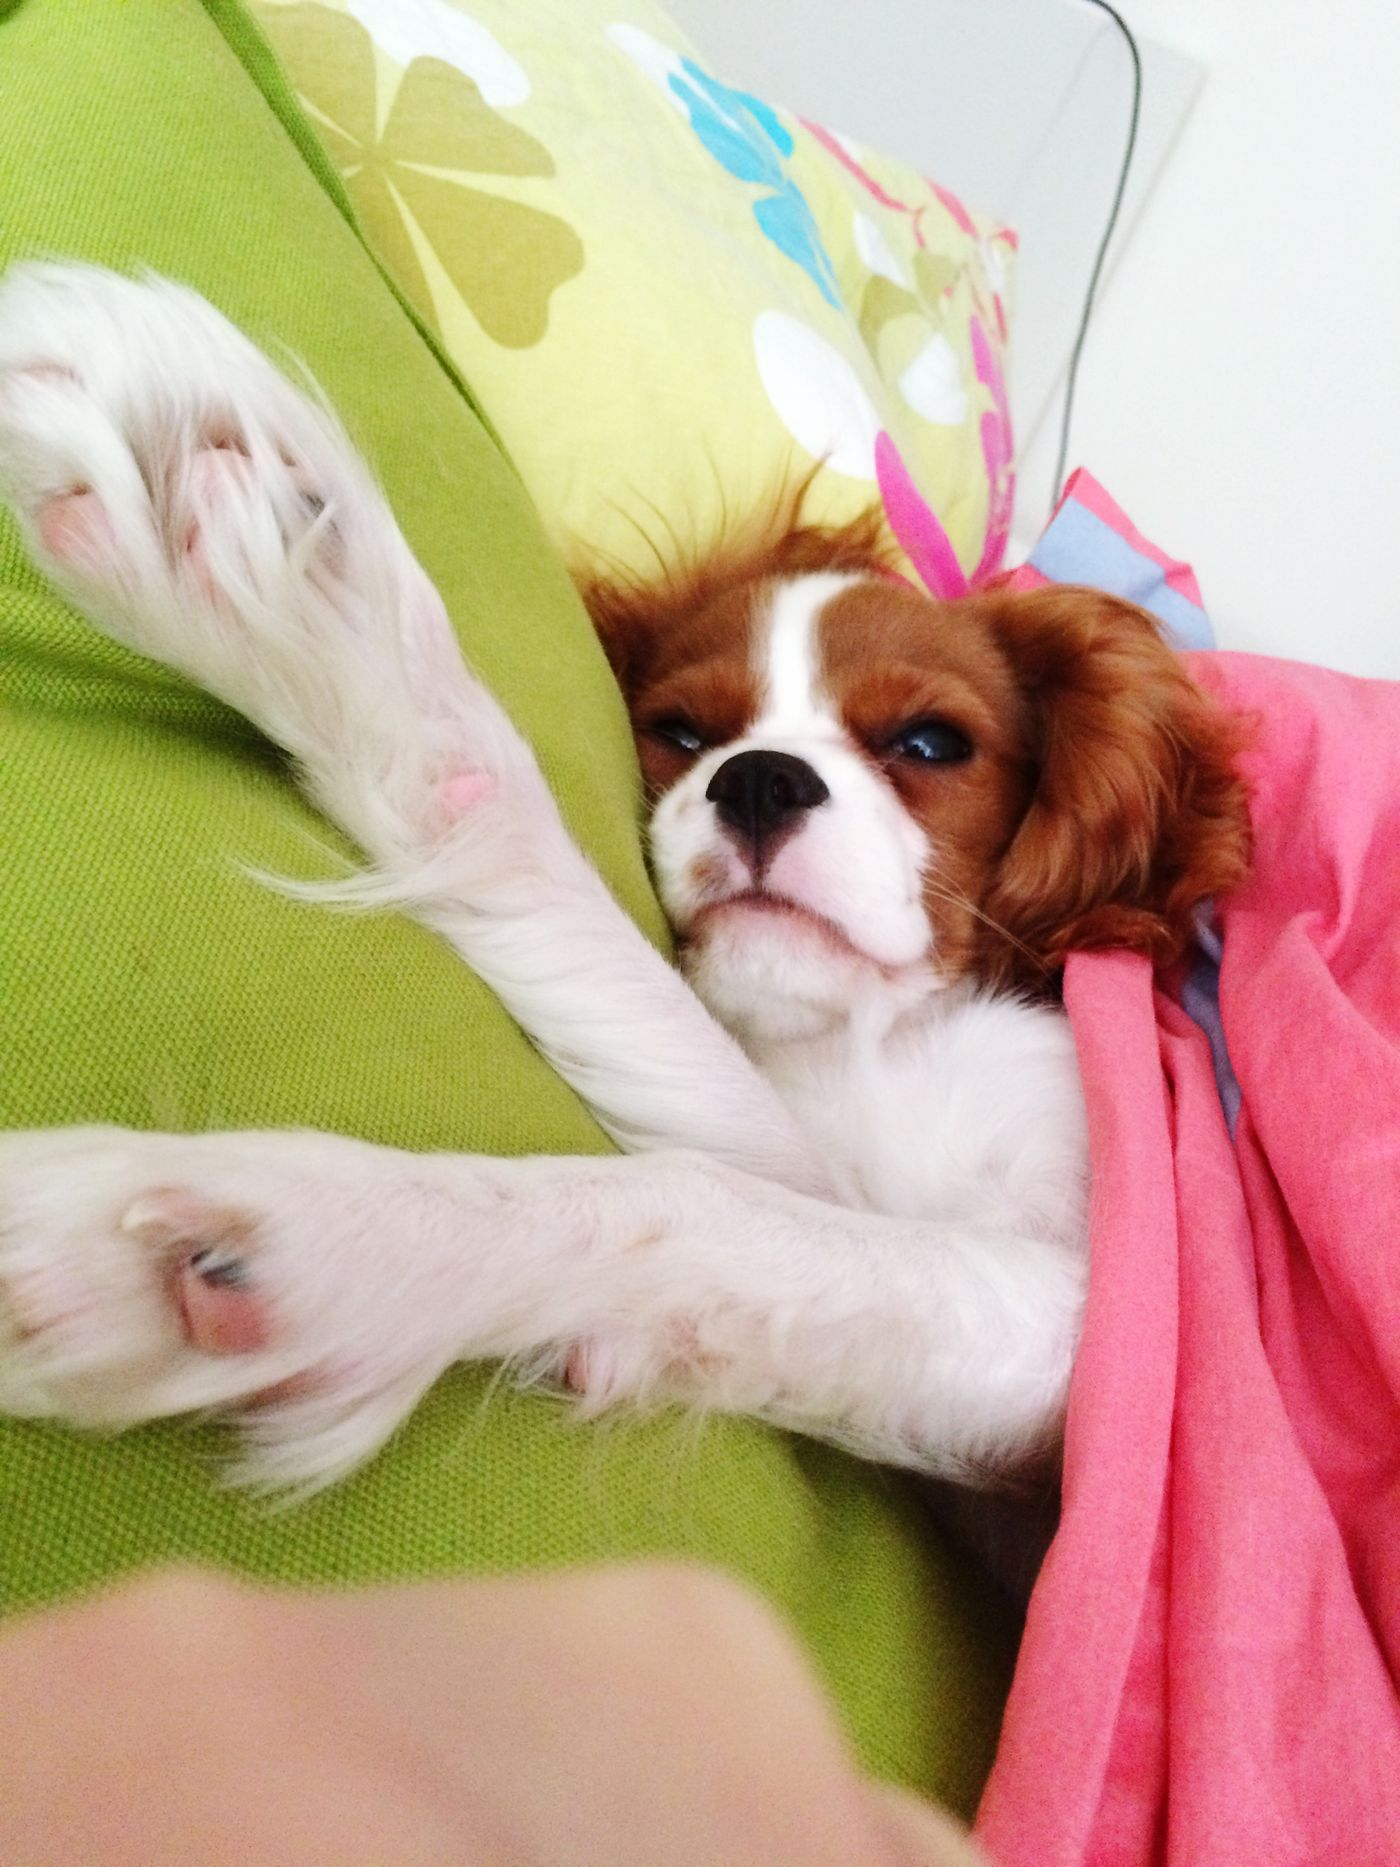 Good morning sunshine Dog Friends Cavalier King Charles Spaniel Sleepin With My Dog Cute Pets